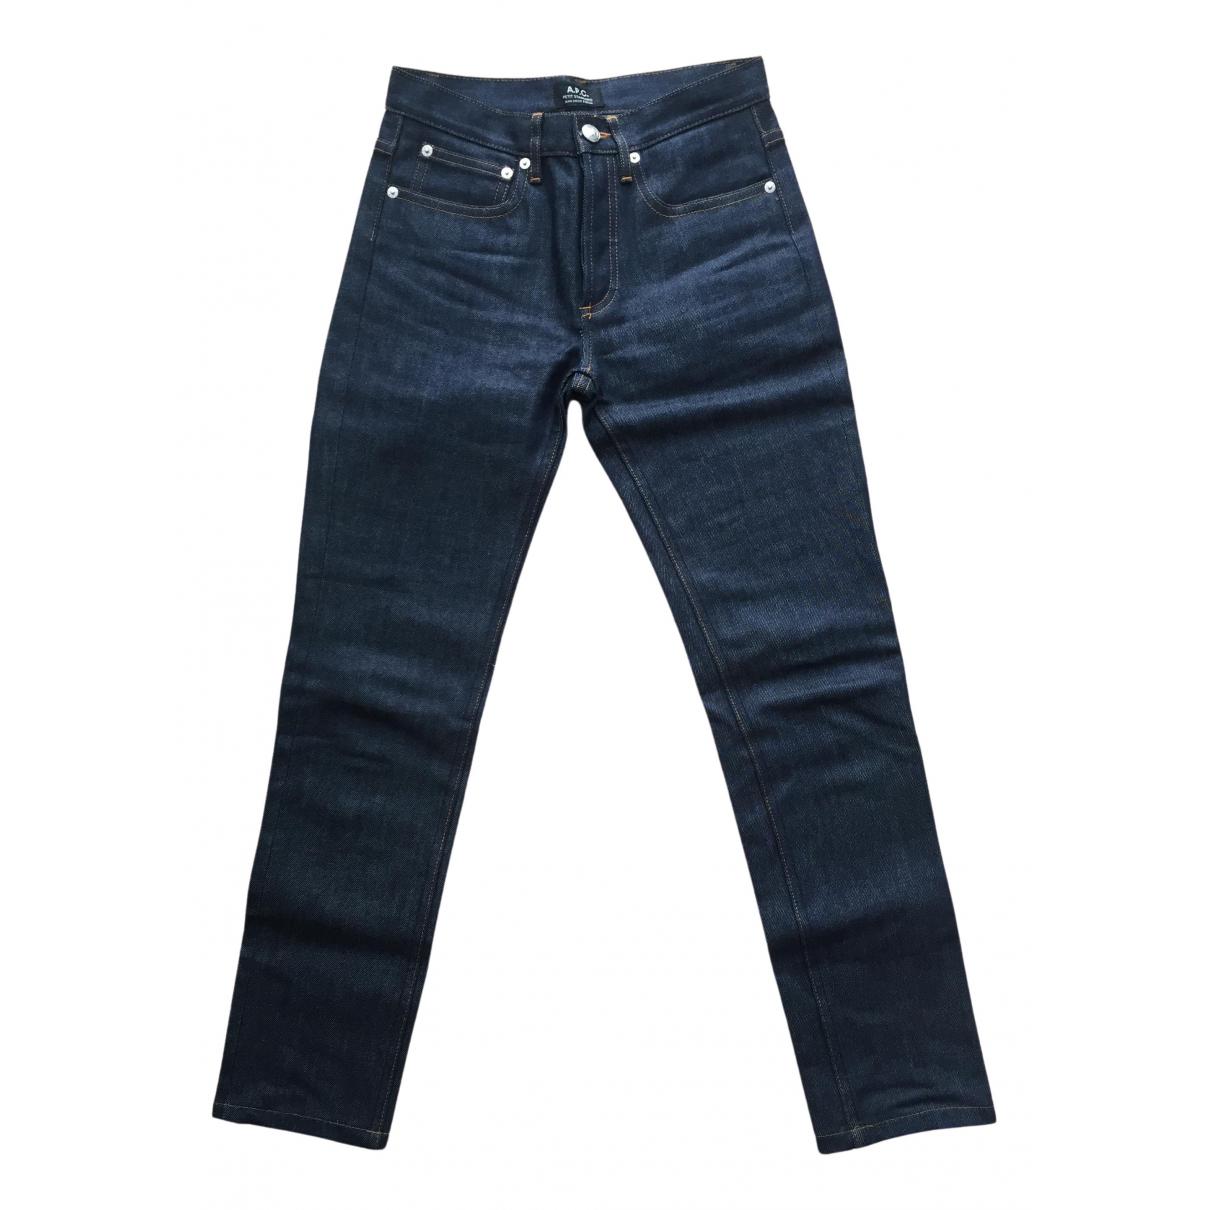 Apc \N Blue Denim - Jeans Jeans for Women 26 US